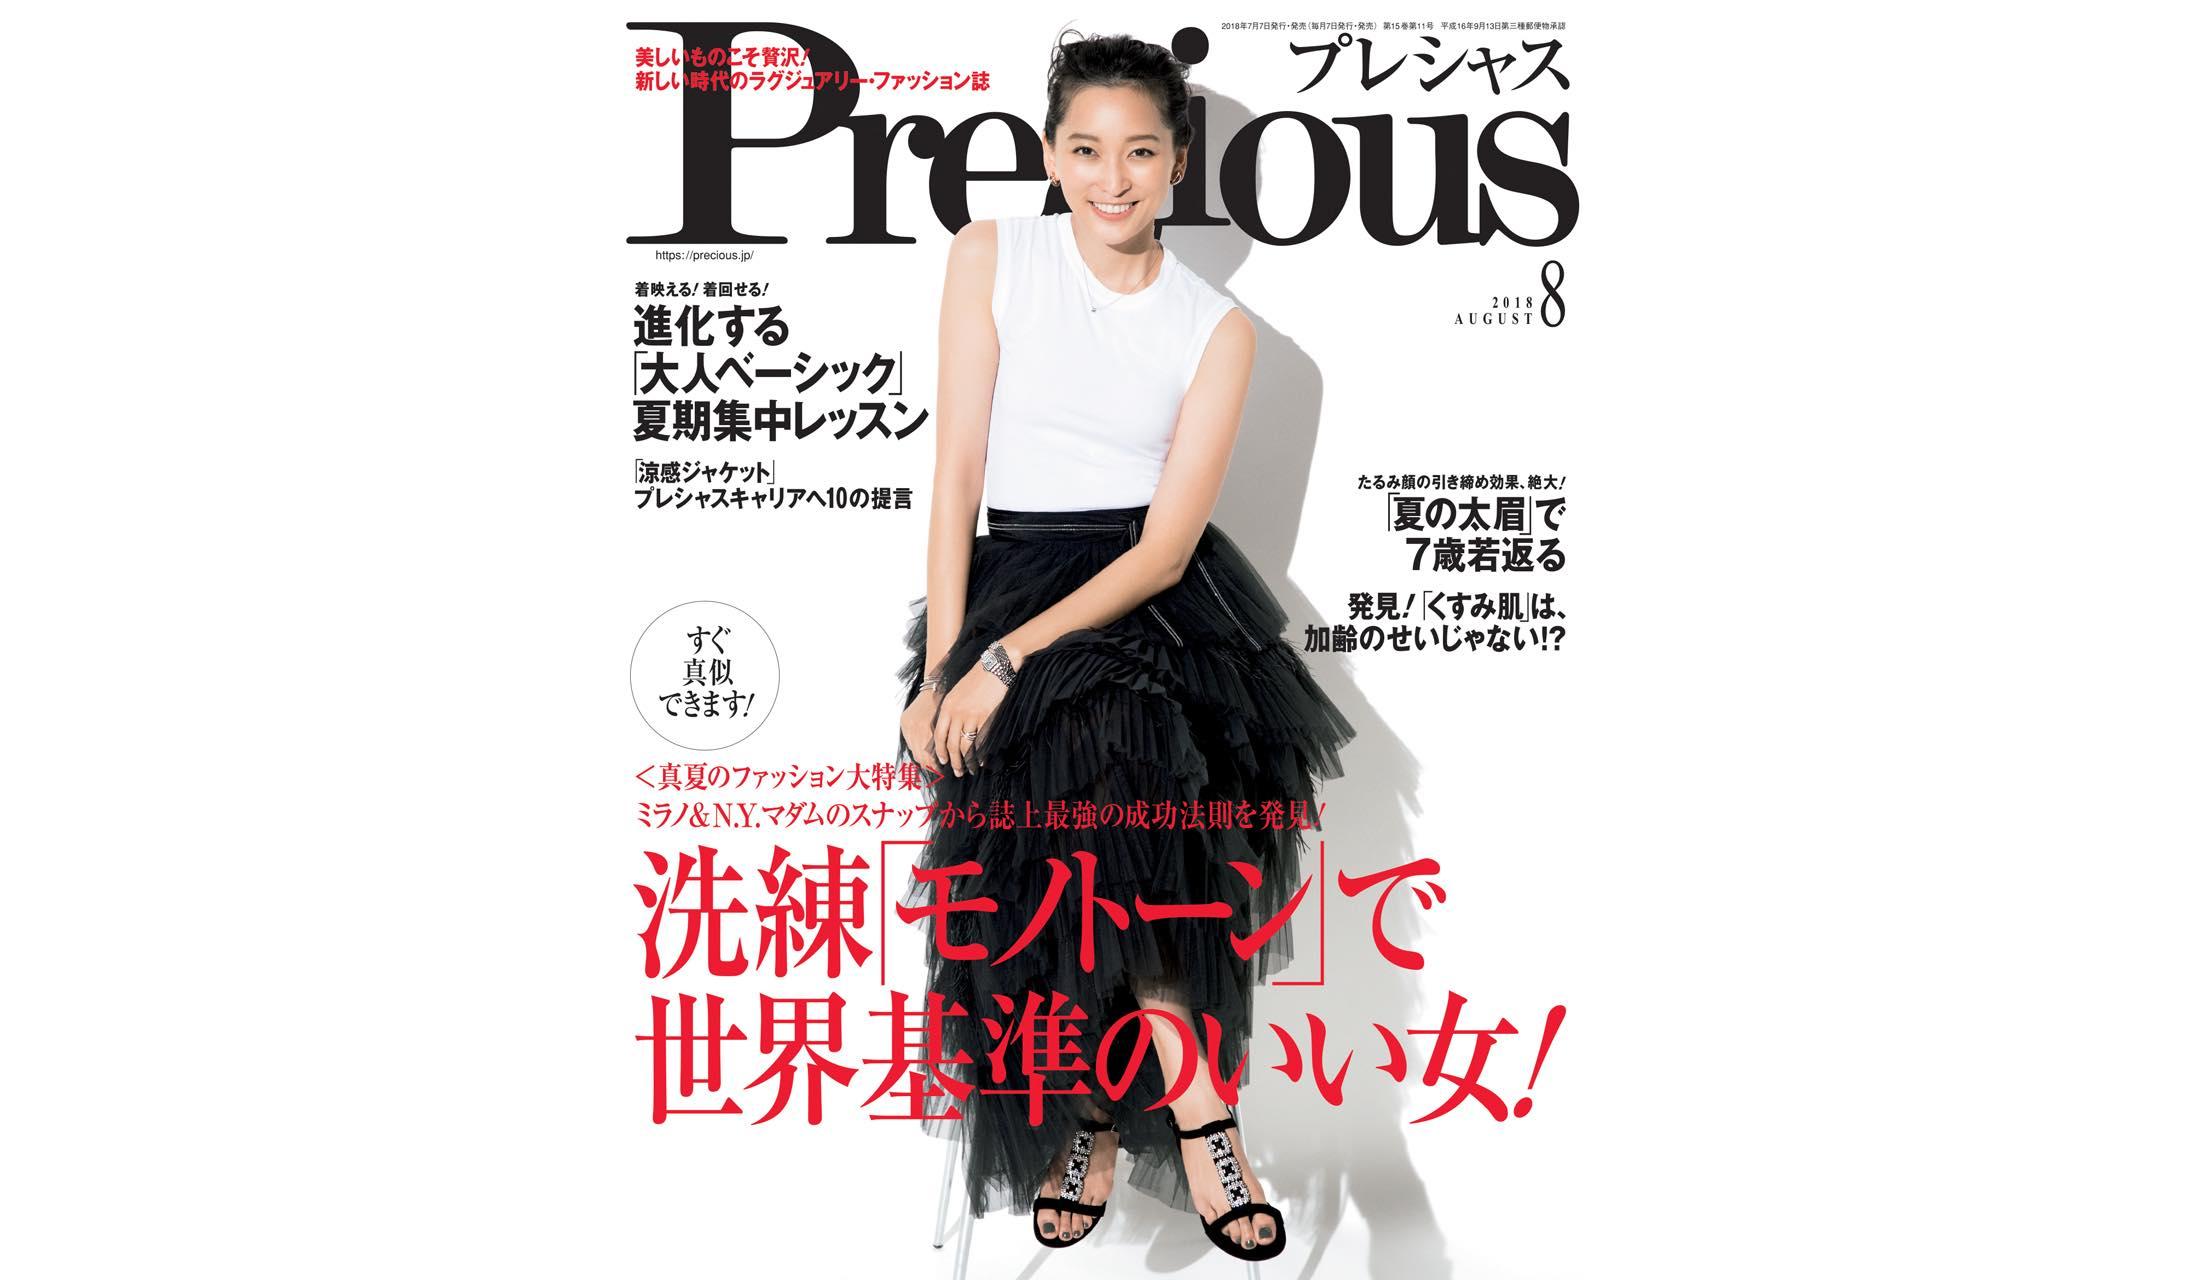 Precious8月号(7月6日発売)の表紙、カバーモデルは女優・杏